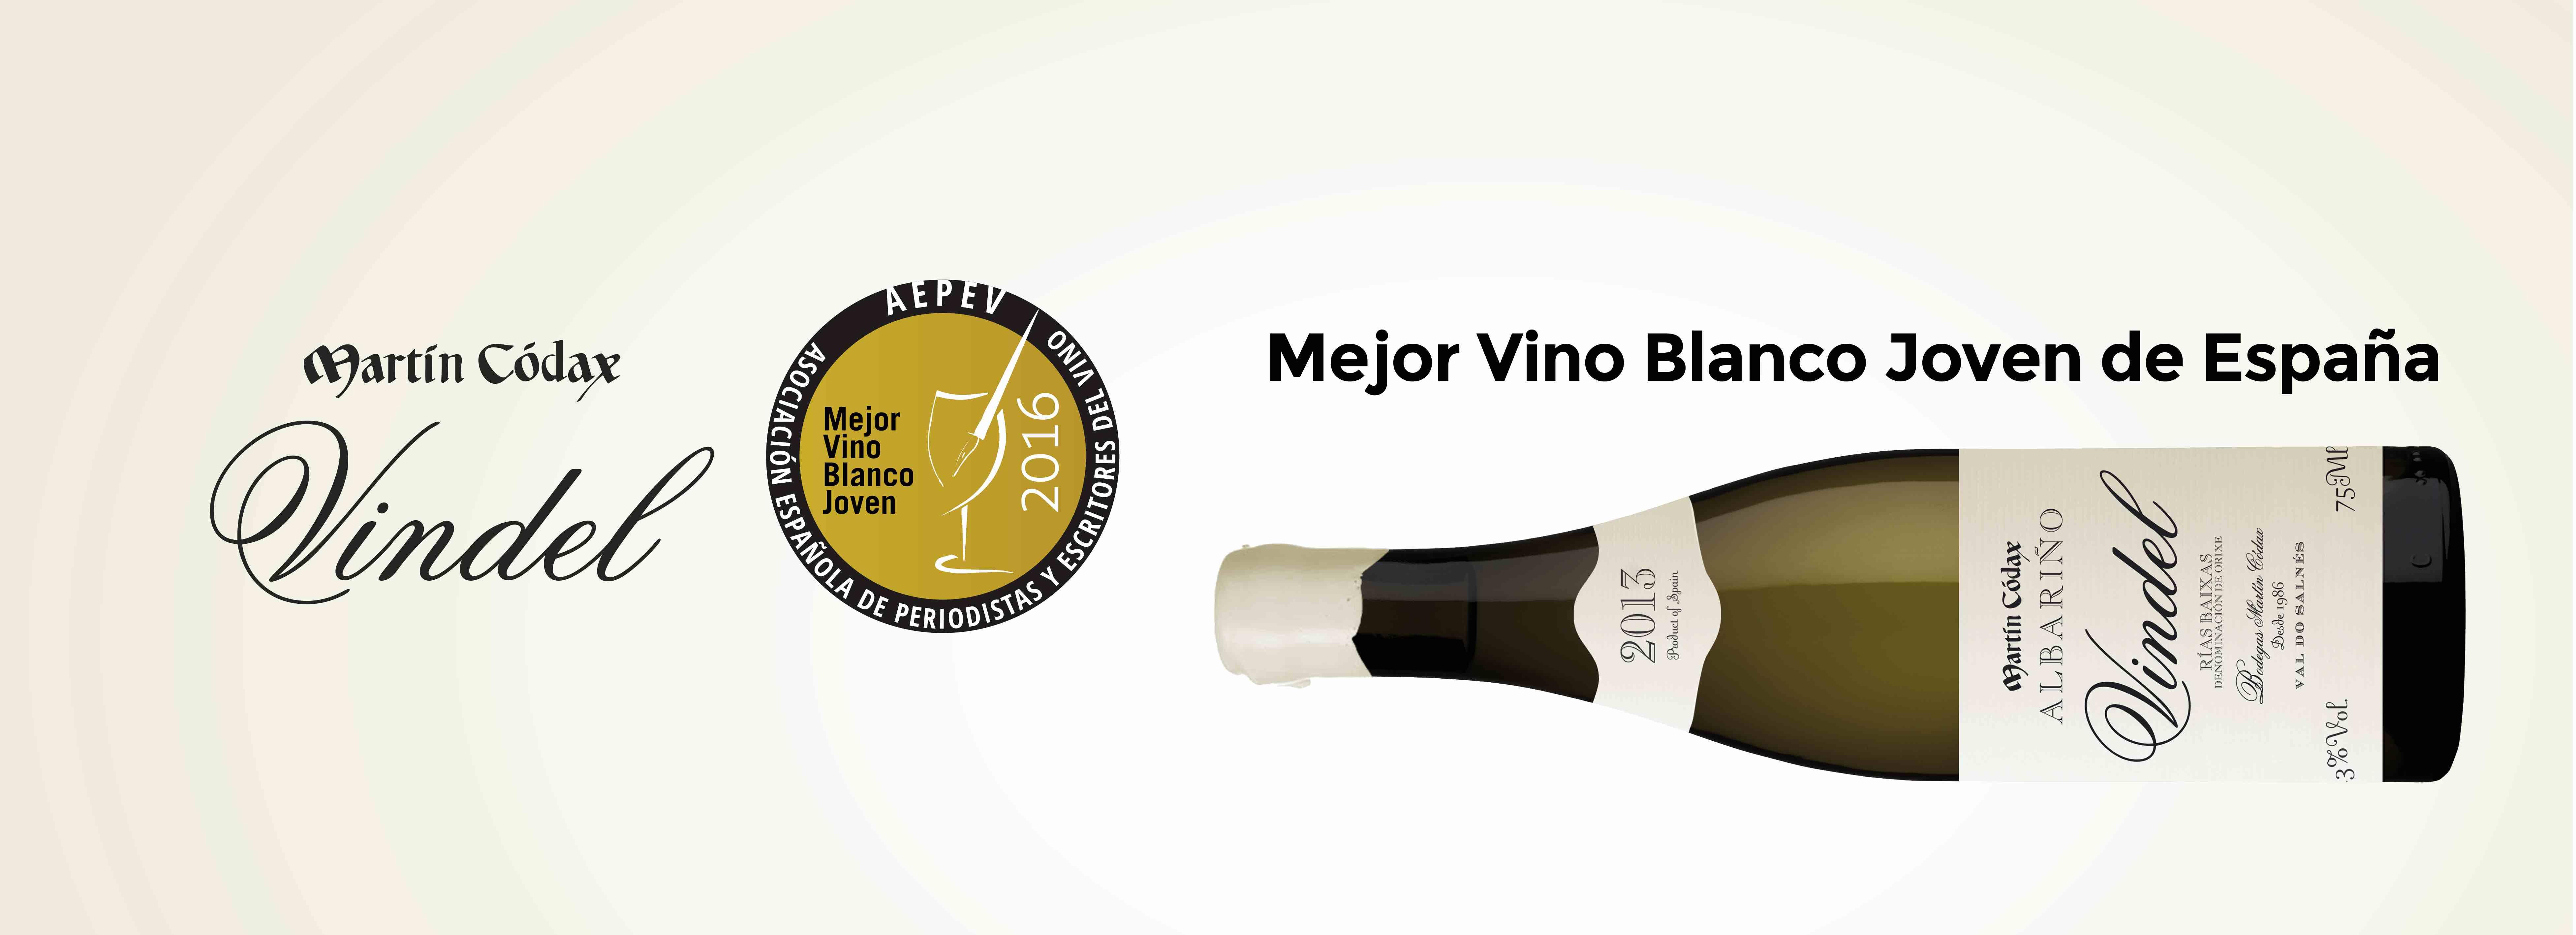 Martín Códax Vindel, Mejor Vino Blanco sin barrica 2016